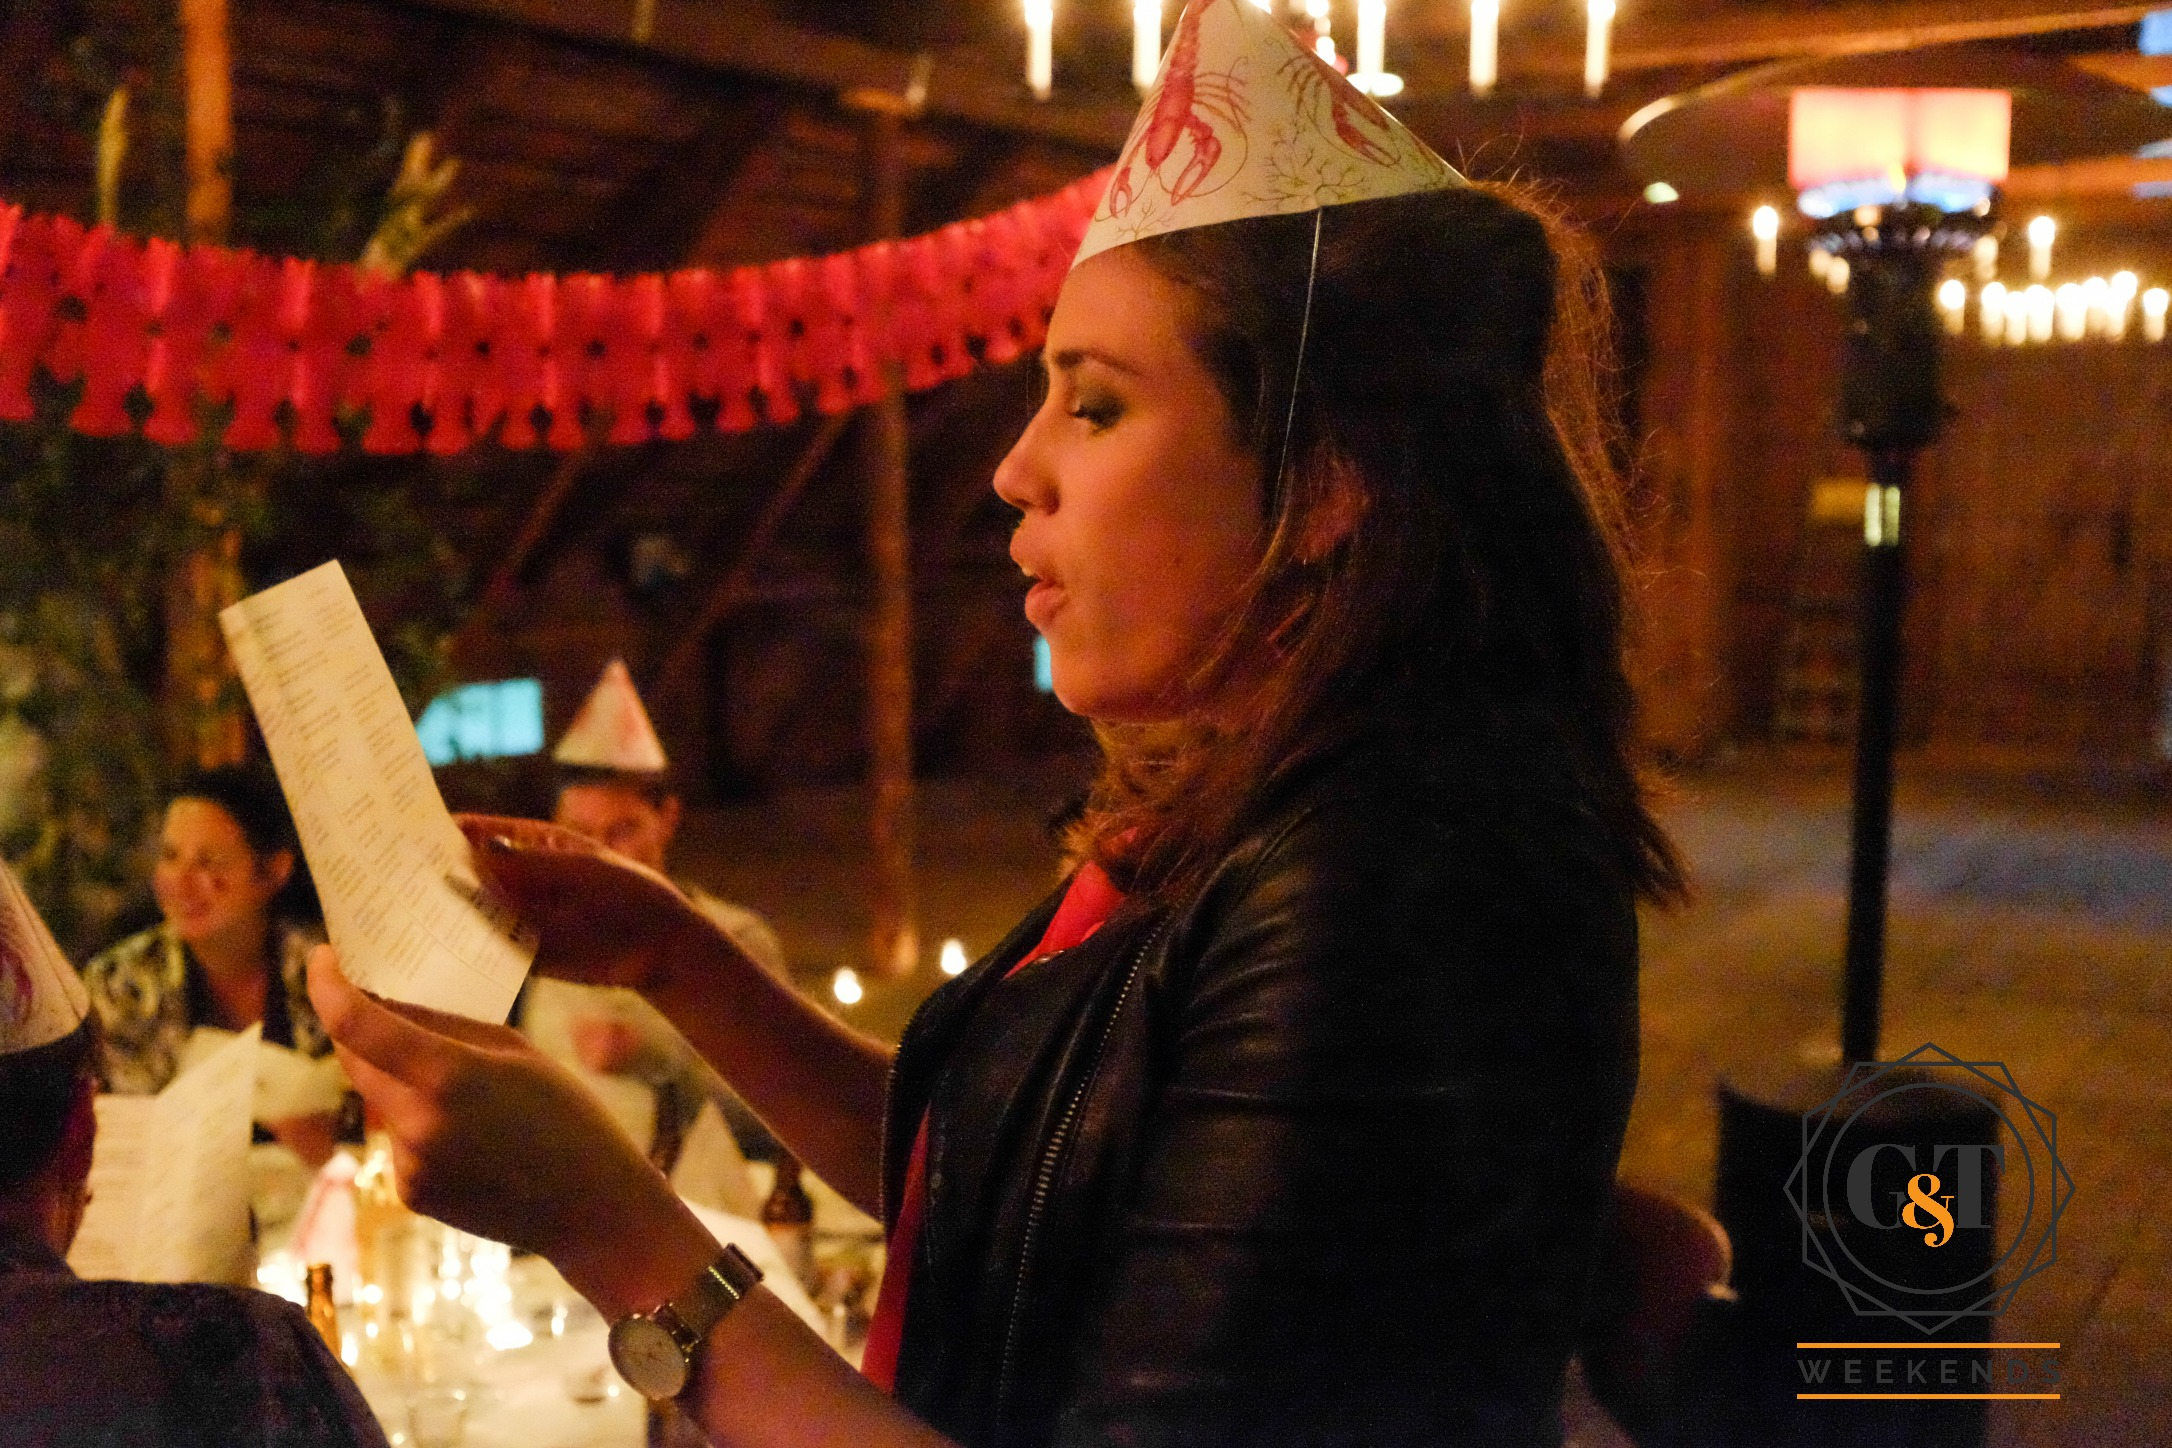 Our Swedish toast master hosting our Swedish Crayfish Party